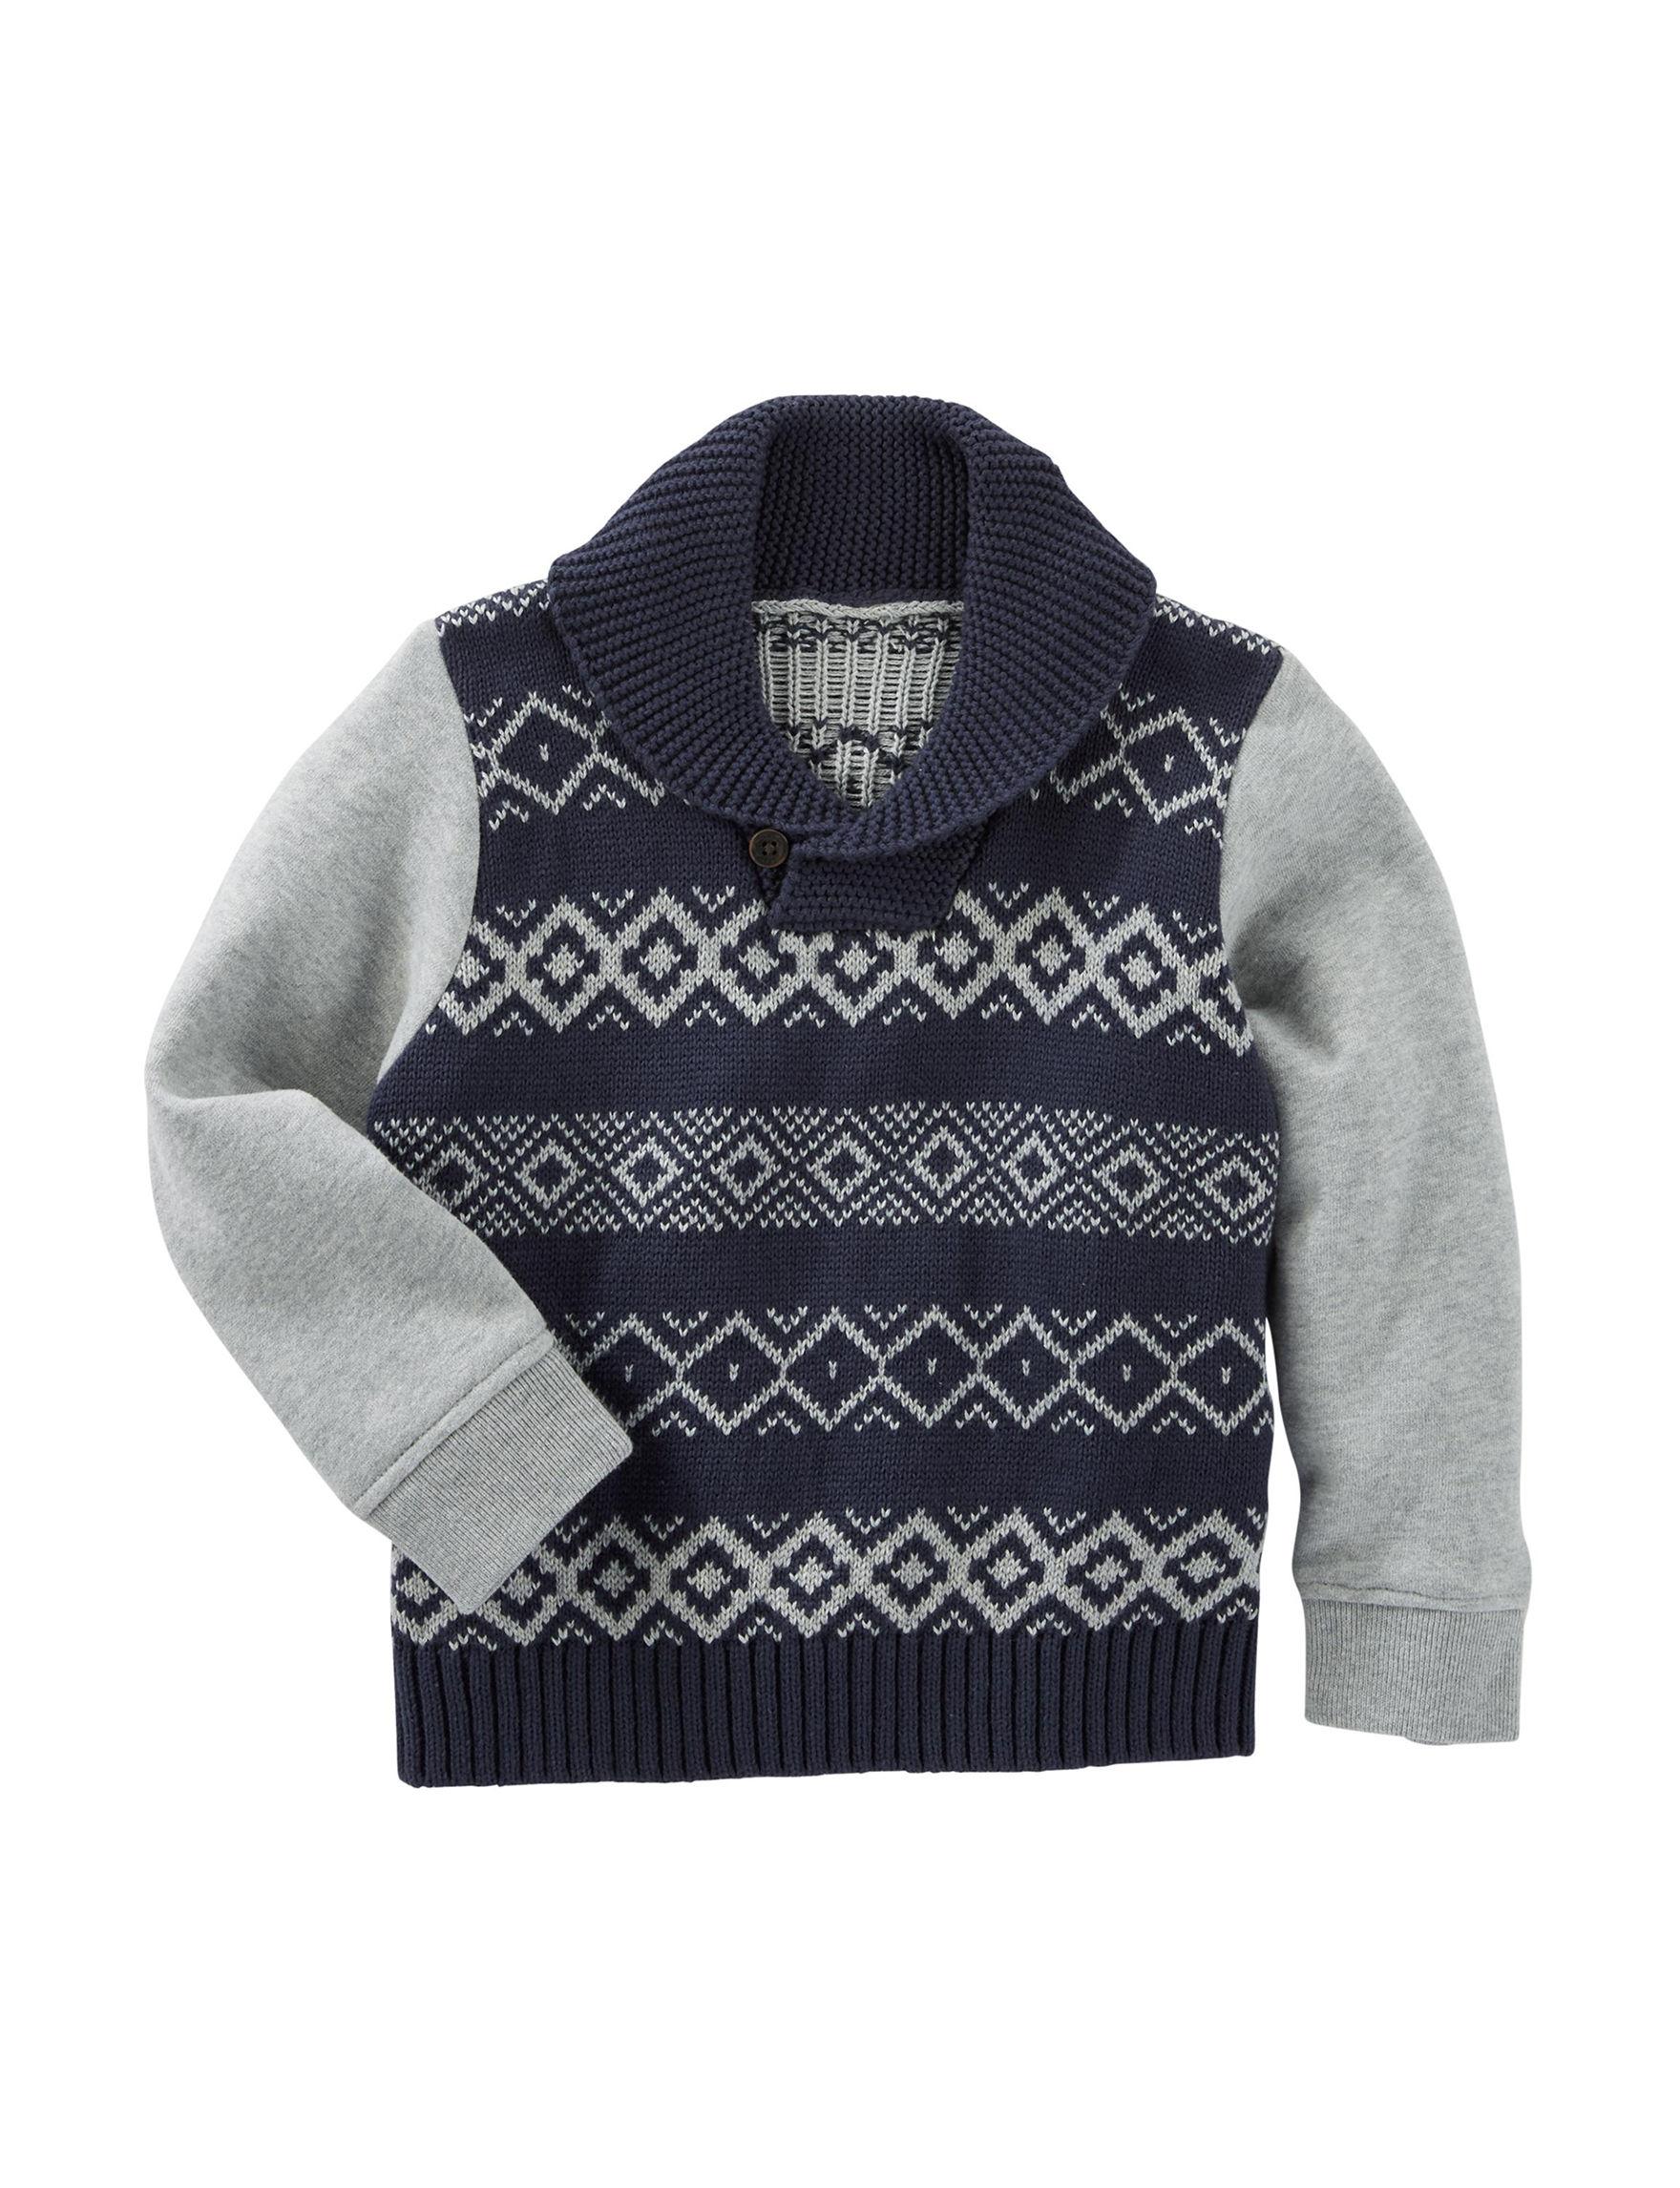 OshKosh B'gosh® Fair Isle Print Sweater - Boys 4-7   Stage Stores